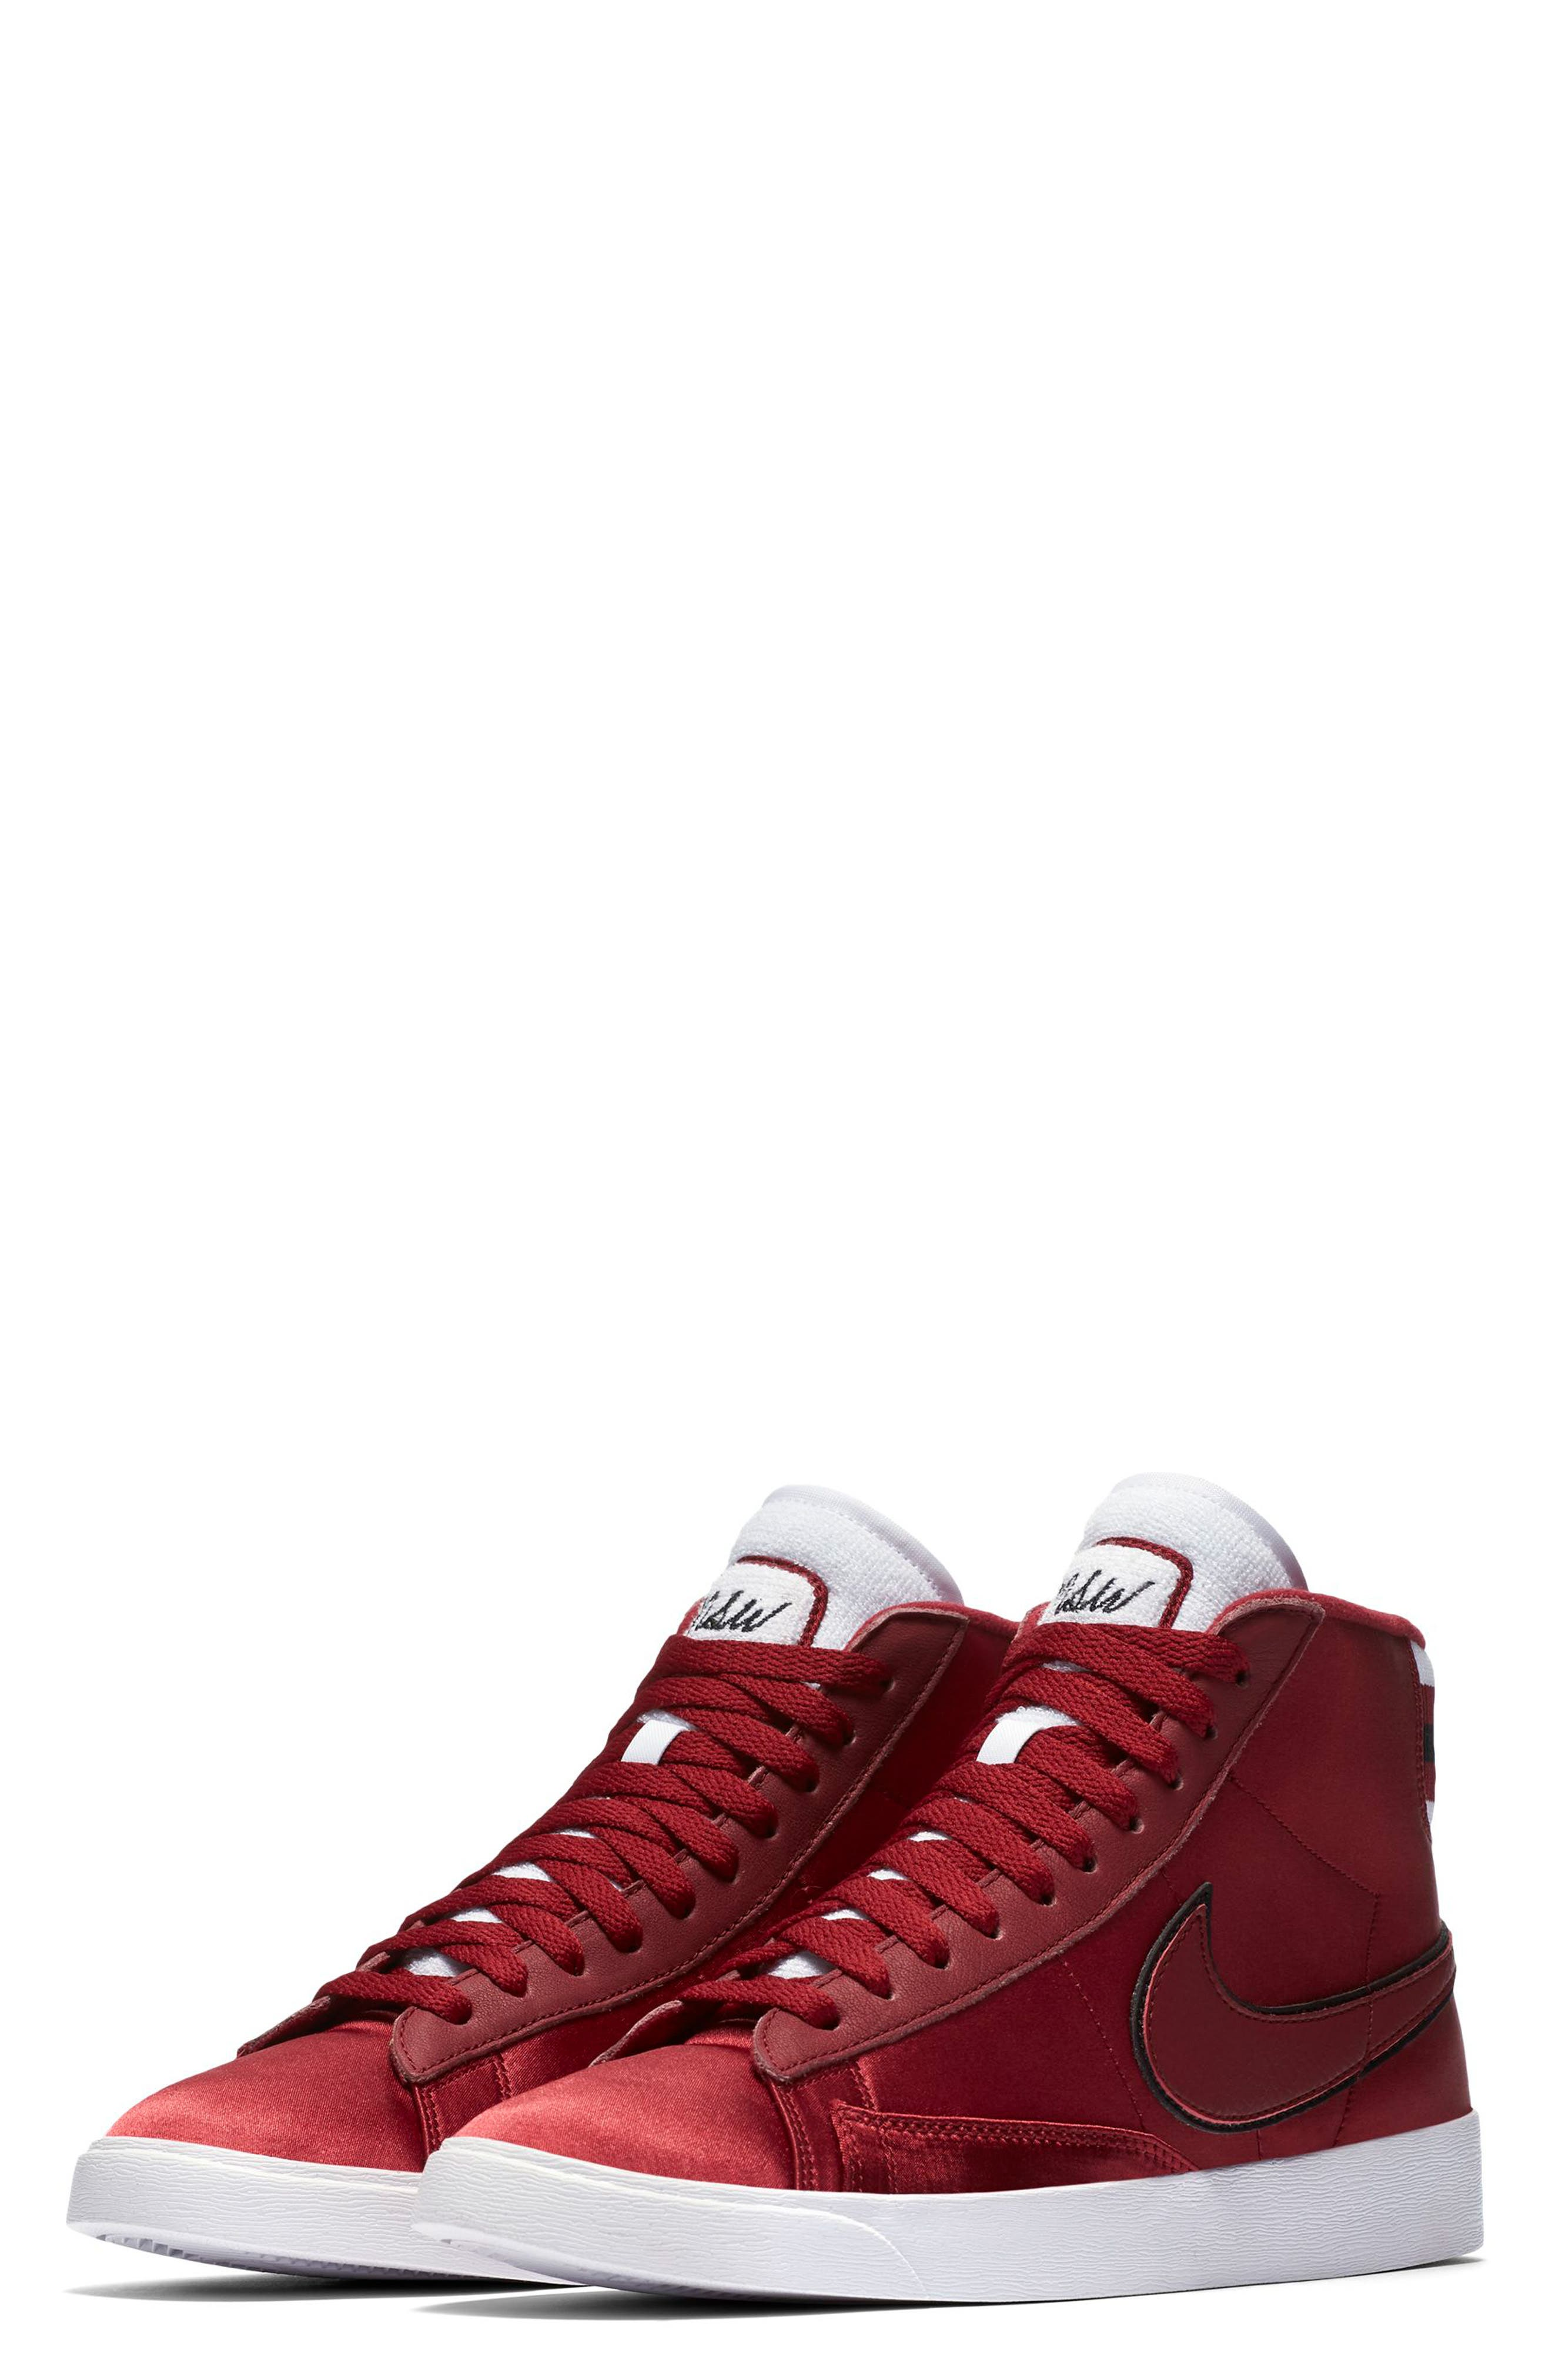 Blazer Mid Top Sneaker,                         Main,                         color, RED CRUSH/ WHITE/ BLACK